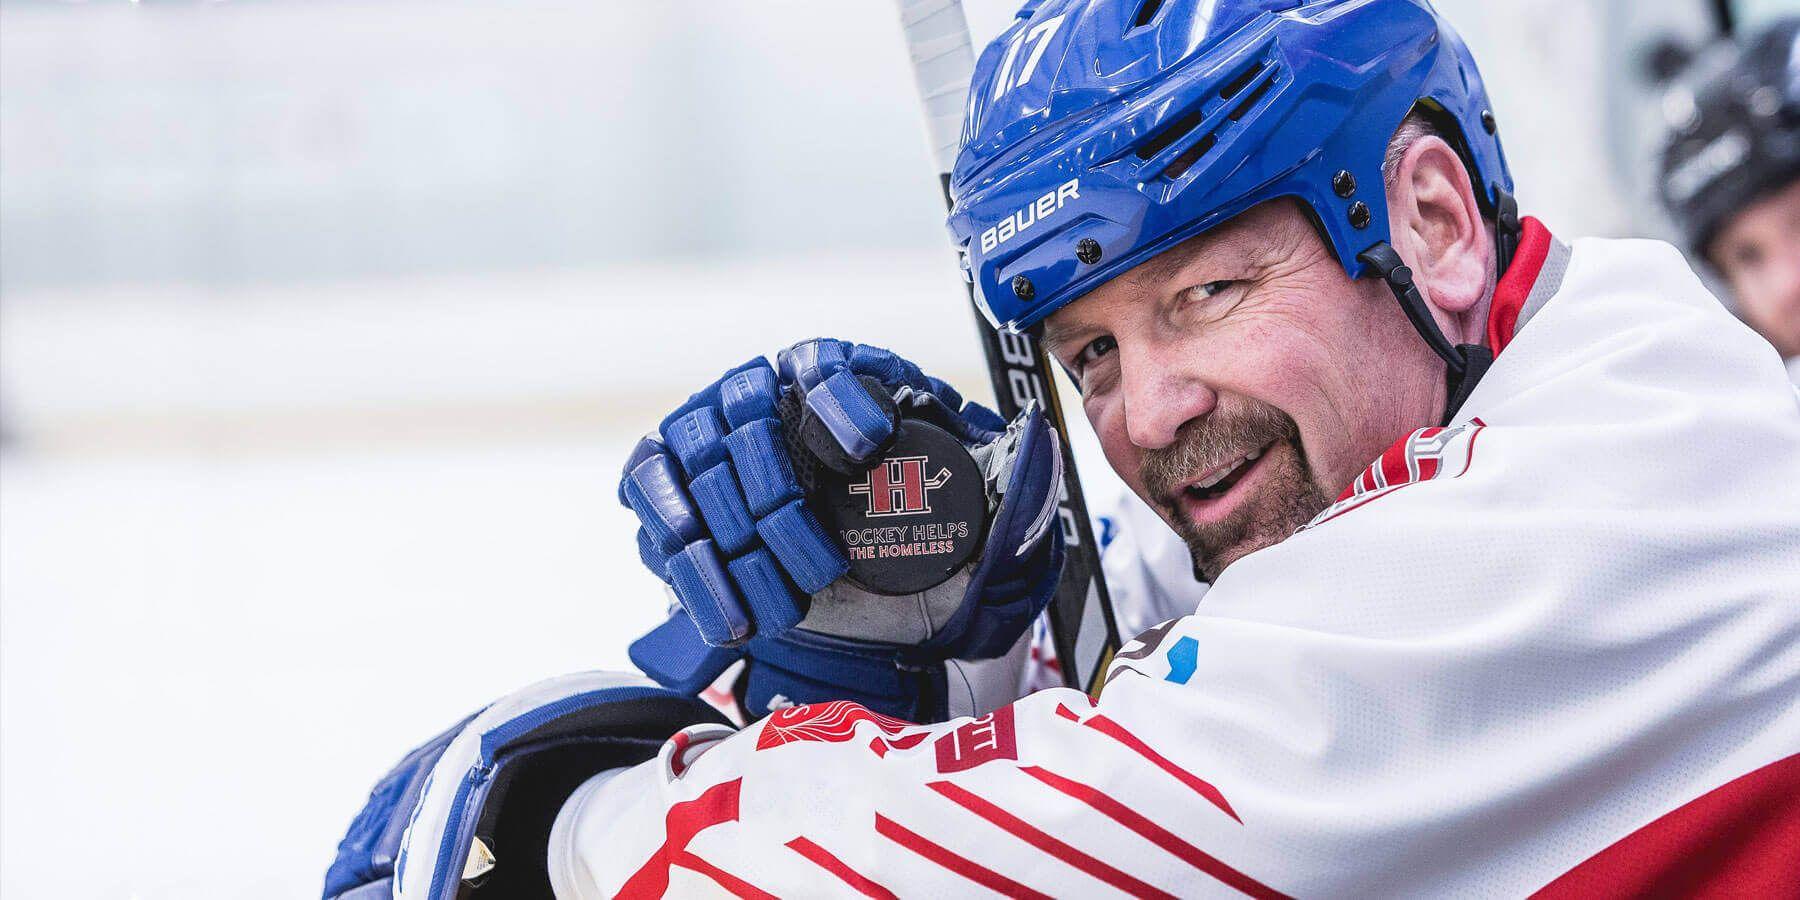 Hockey Helps The Homeless Home